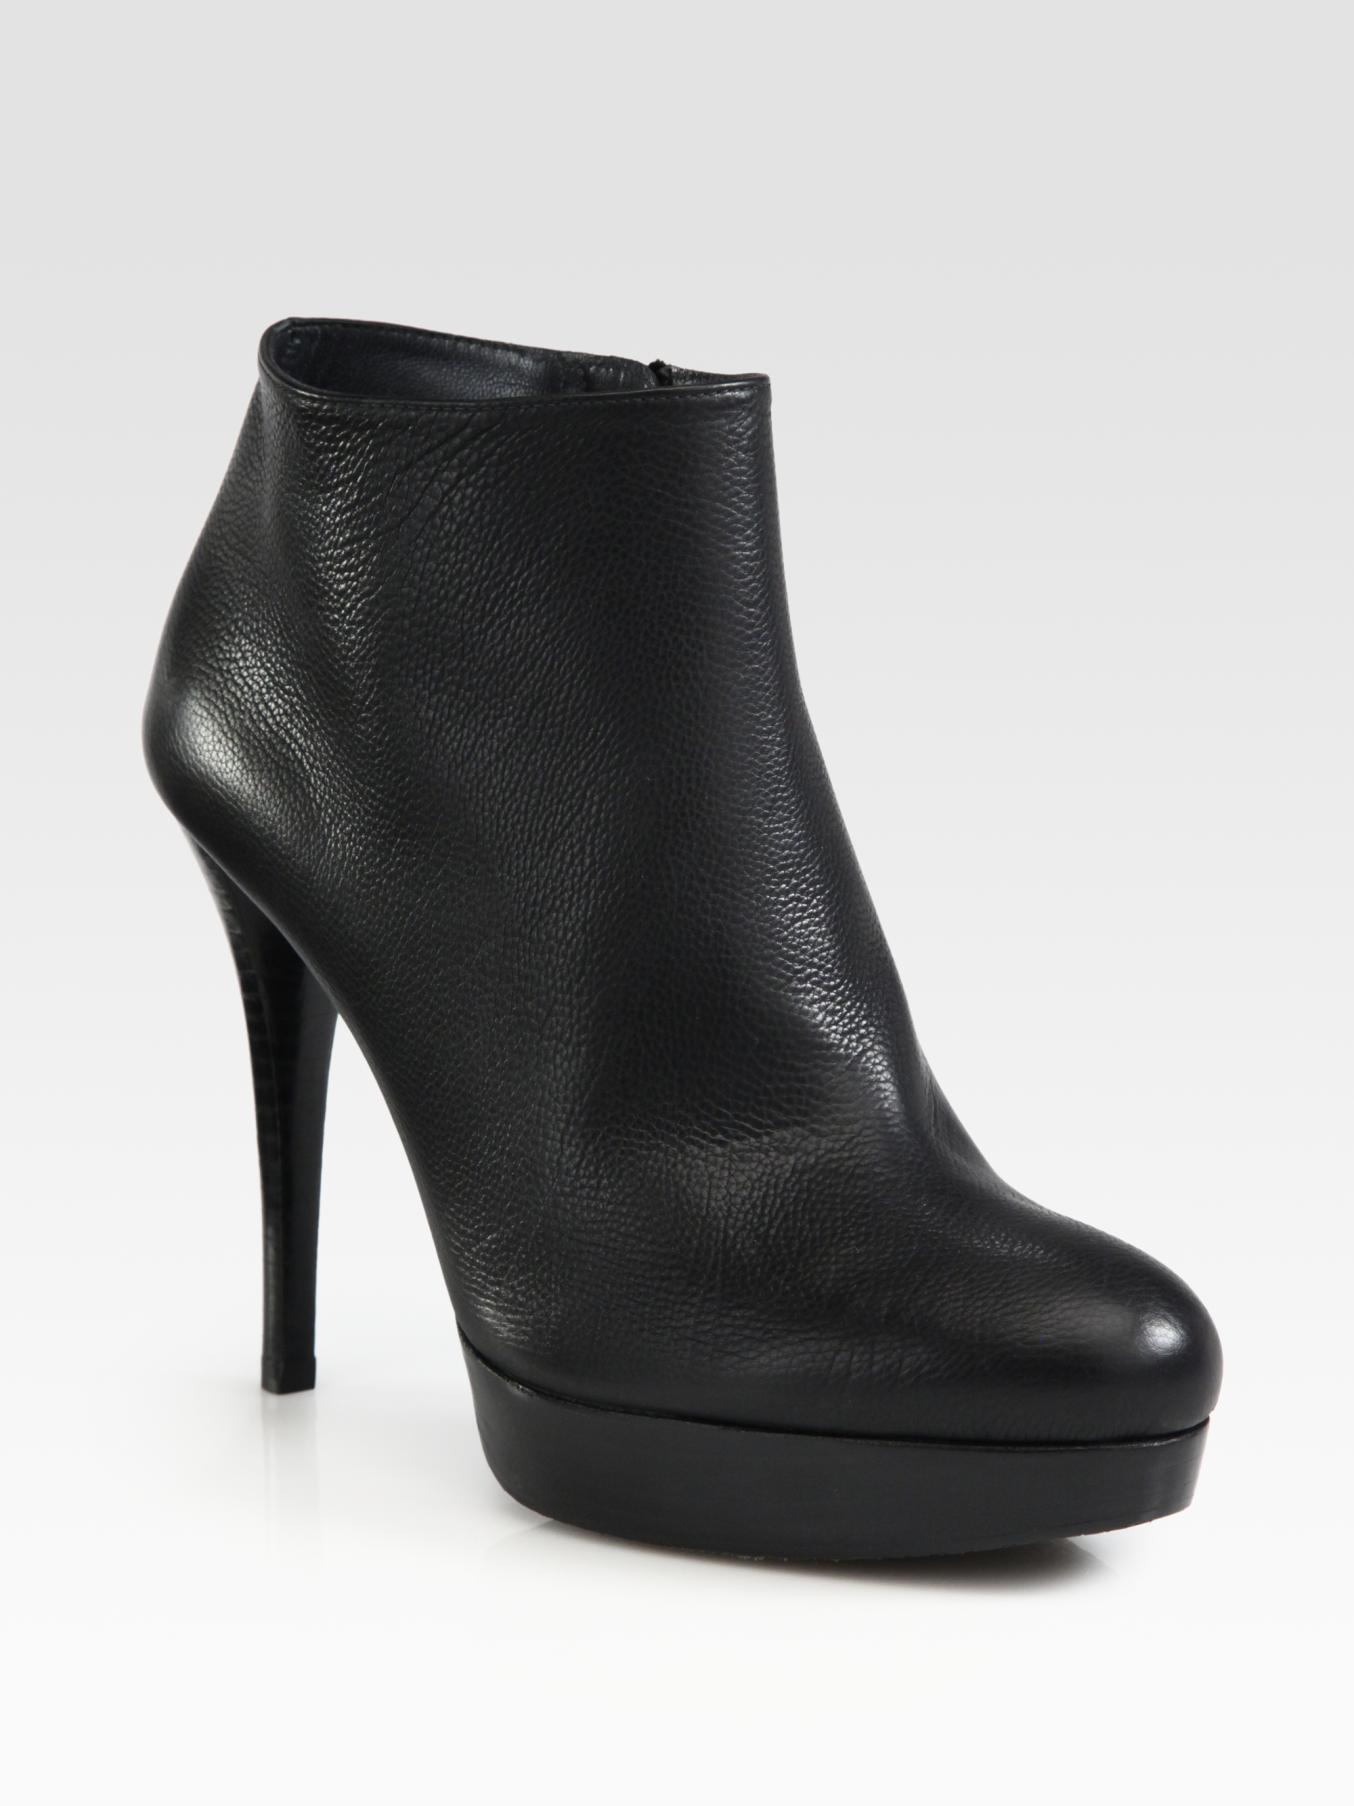 cheap sale 2015 new cheap USA stockist Stuart Weitzman Leather Platform Boots 2014 newest online wholesale price cheap online for cheap for sale stFWO9wkHb